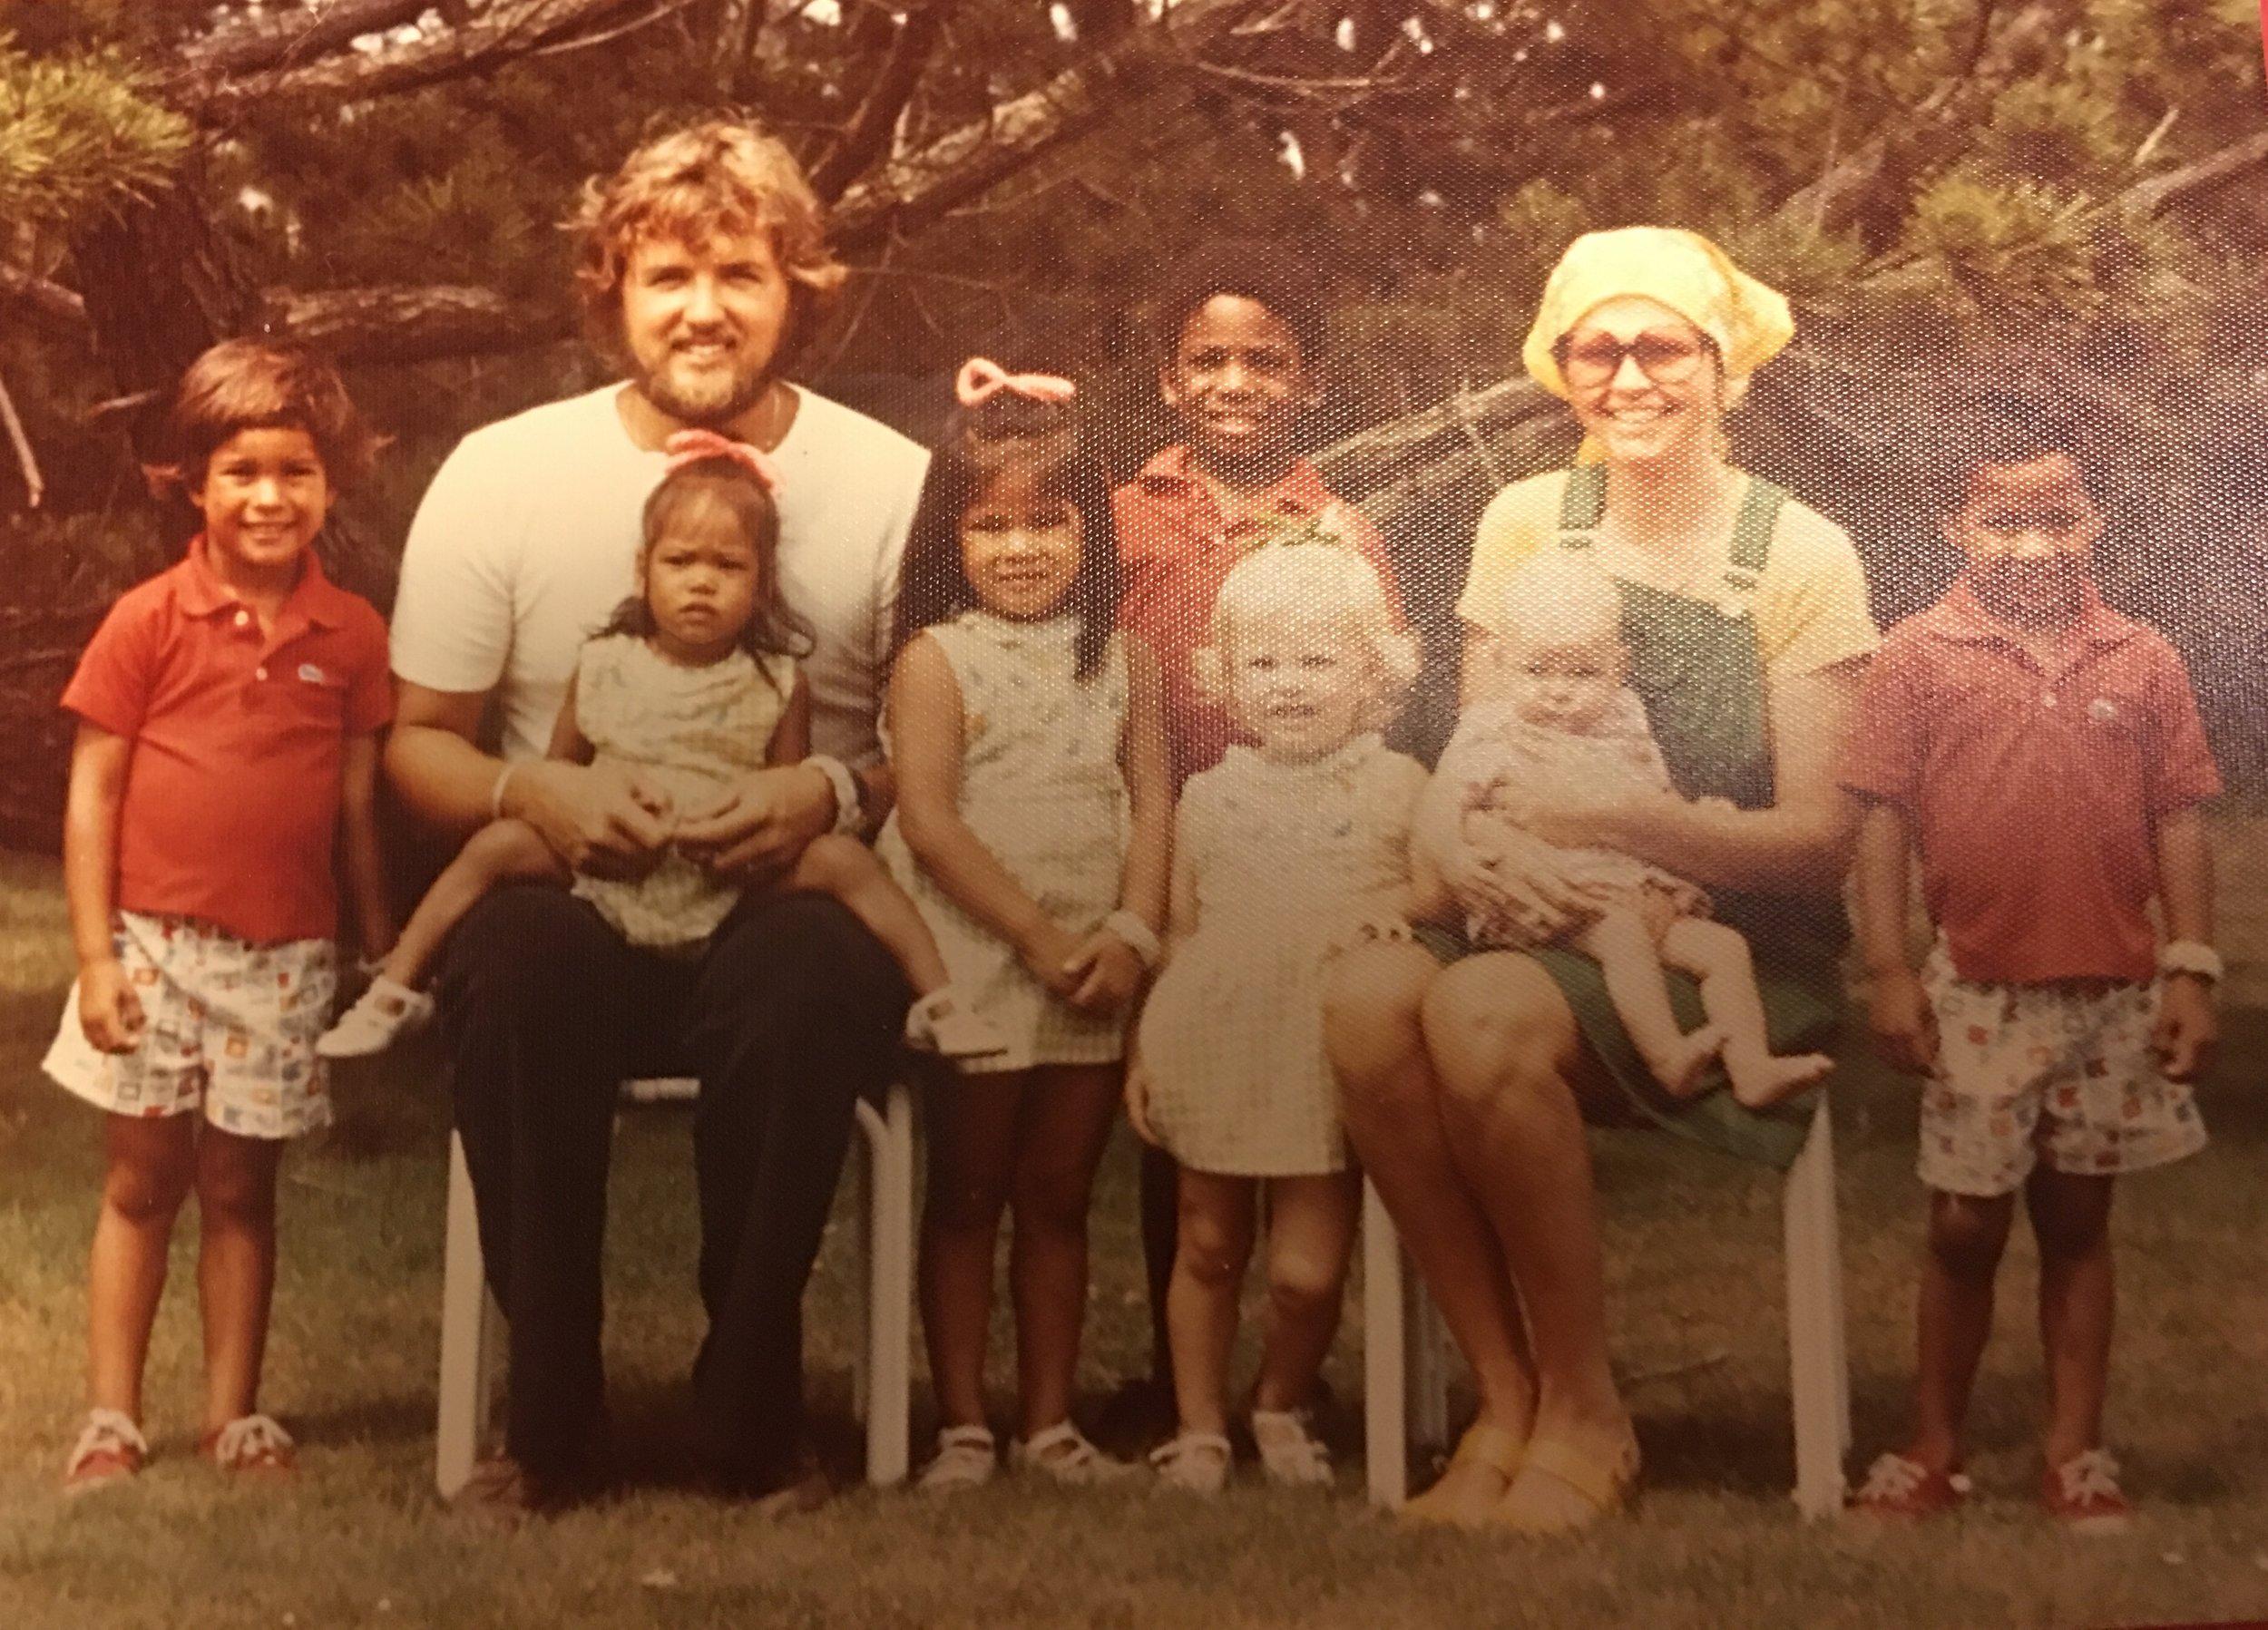 circa 1976 - I'm the baby